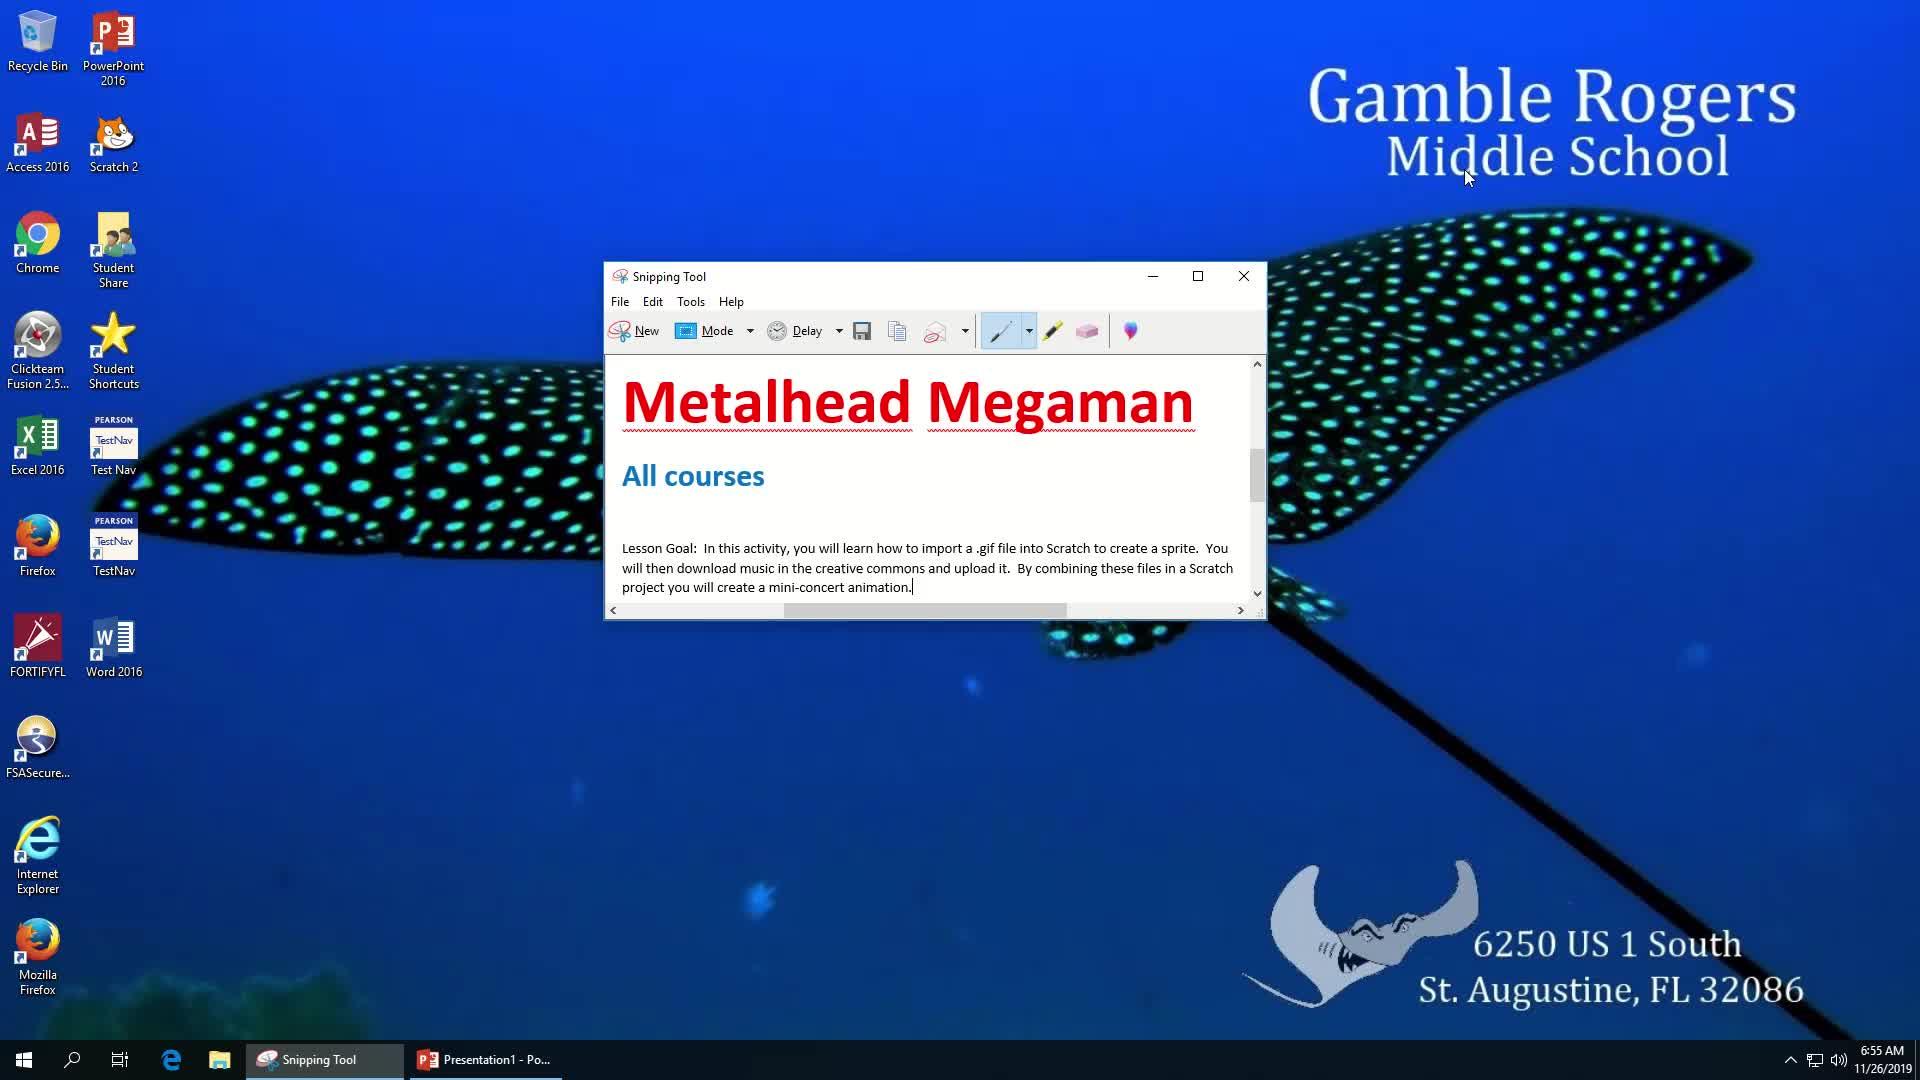 Metalhead Megaman Video Instructions